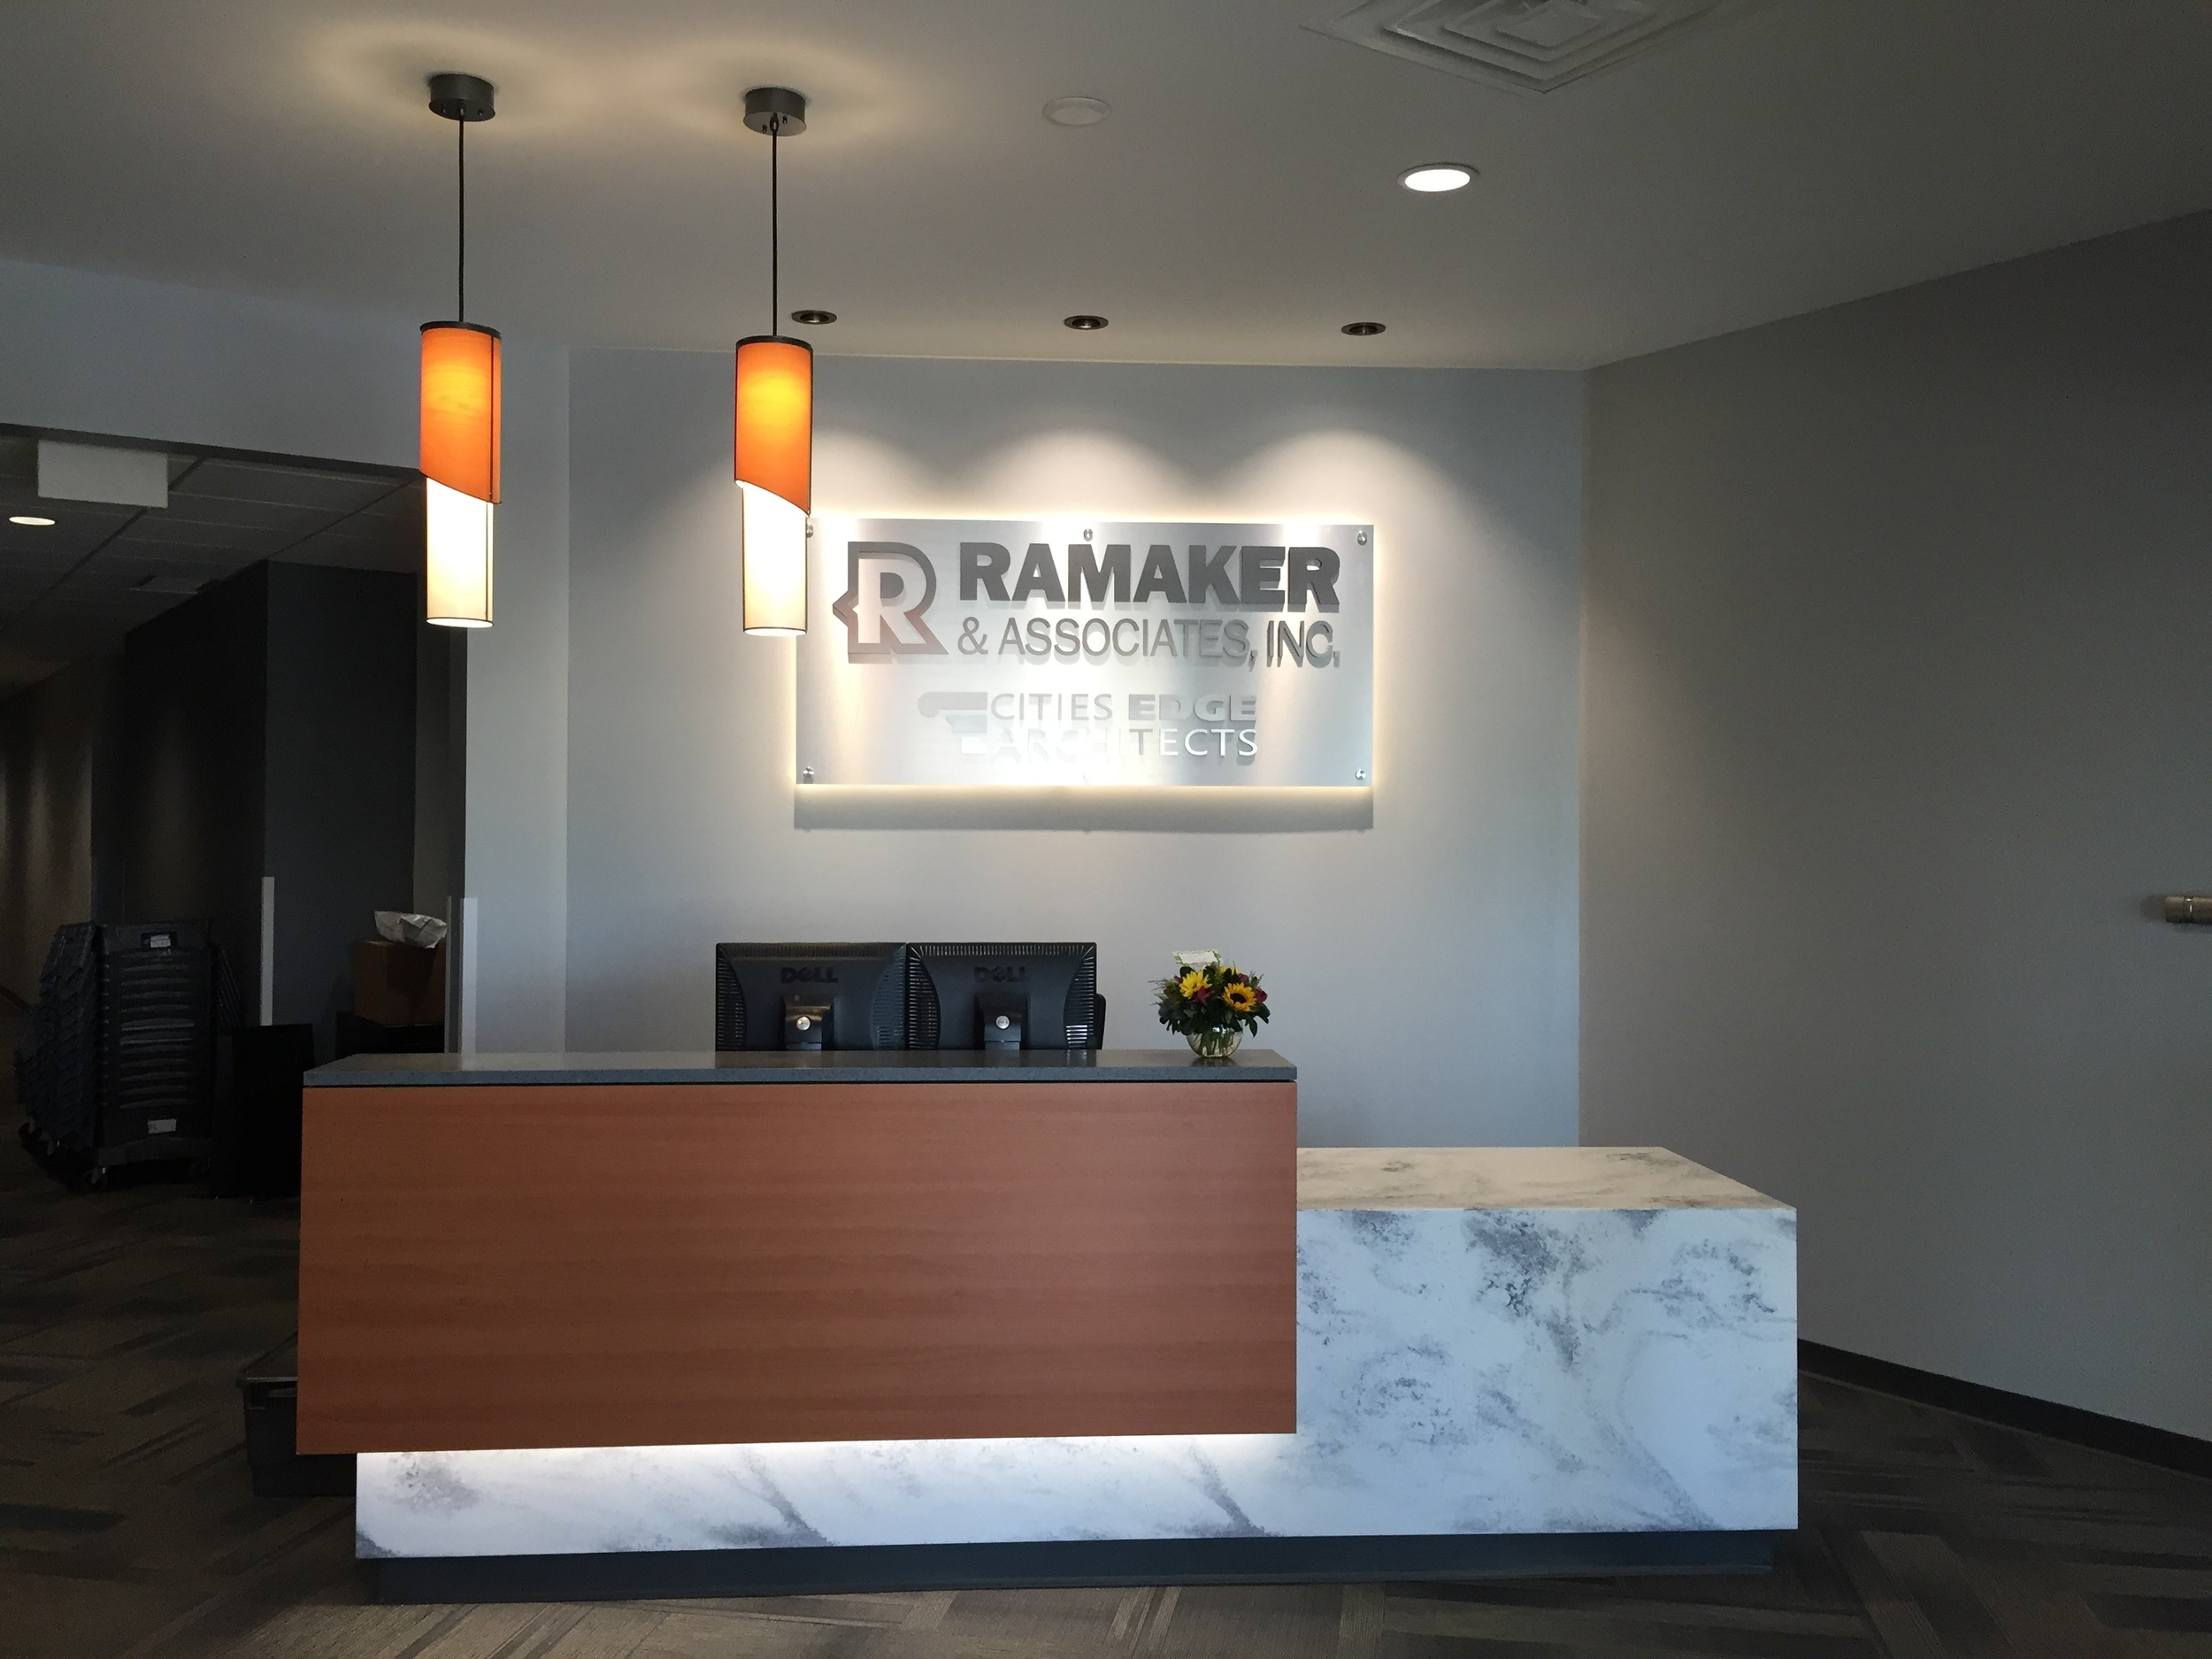 RMAKER front desk area